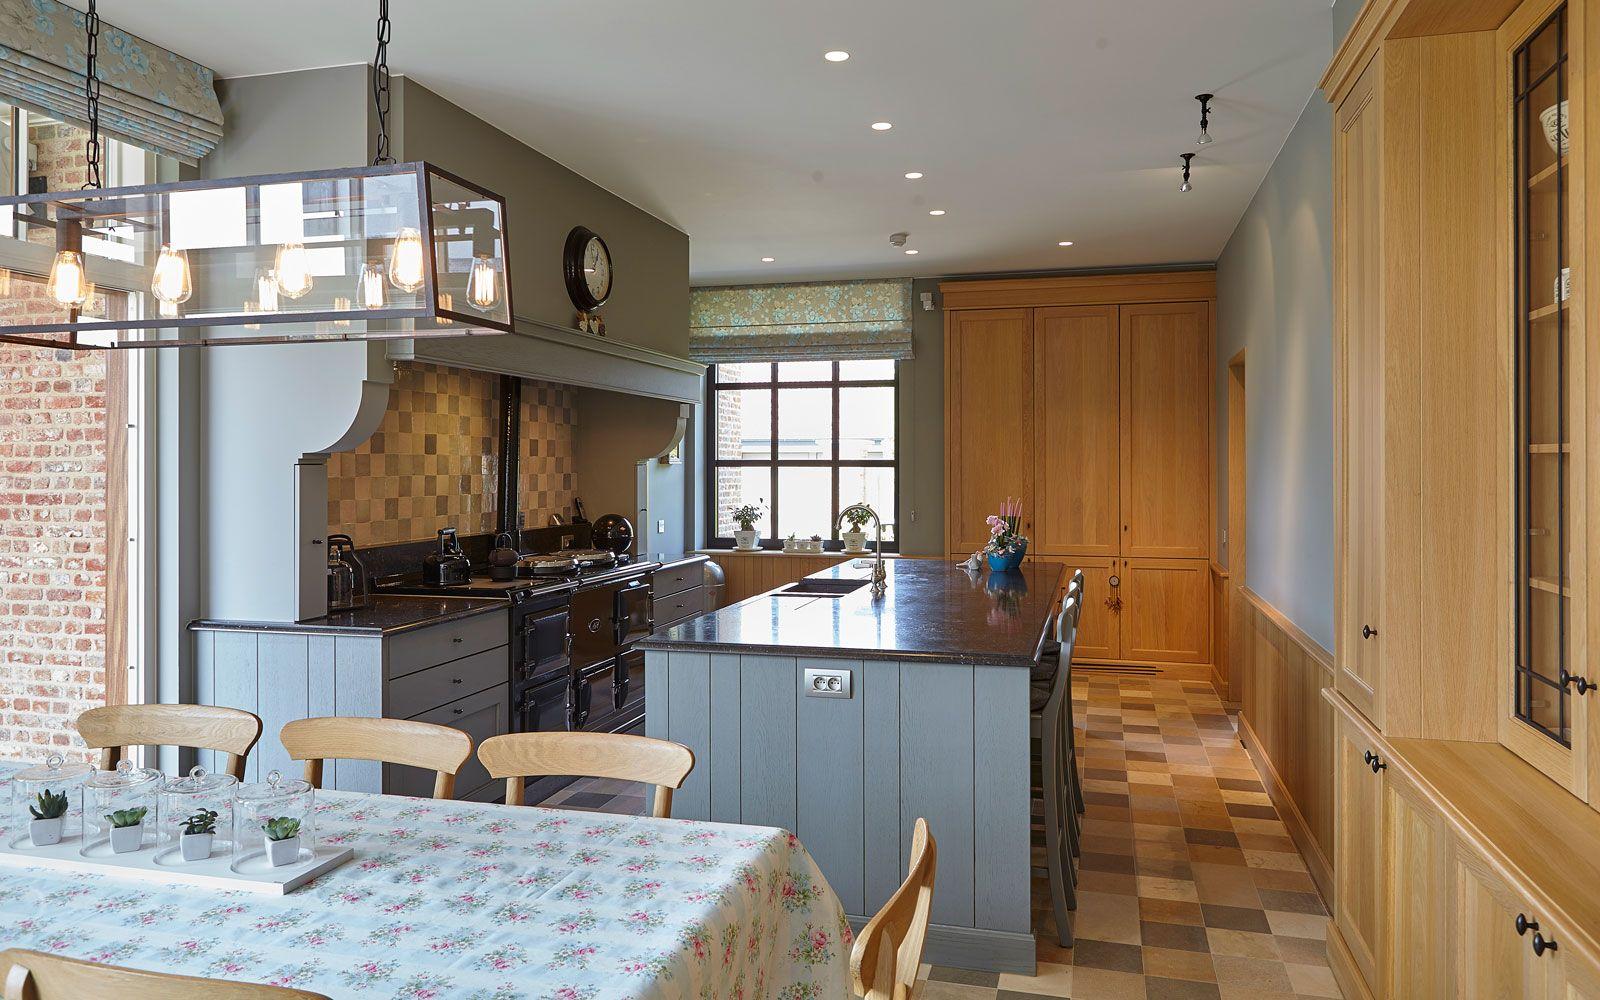 Klassieke keuken frank tack bart franÇois project via